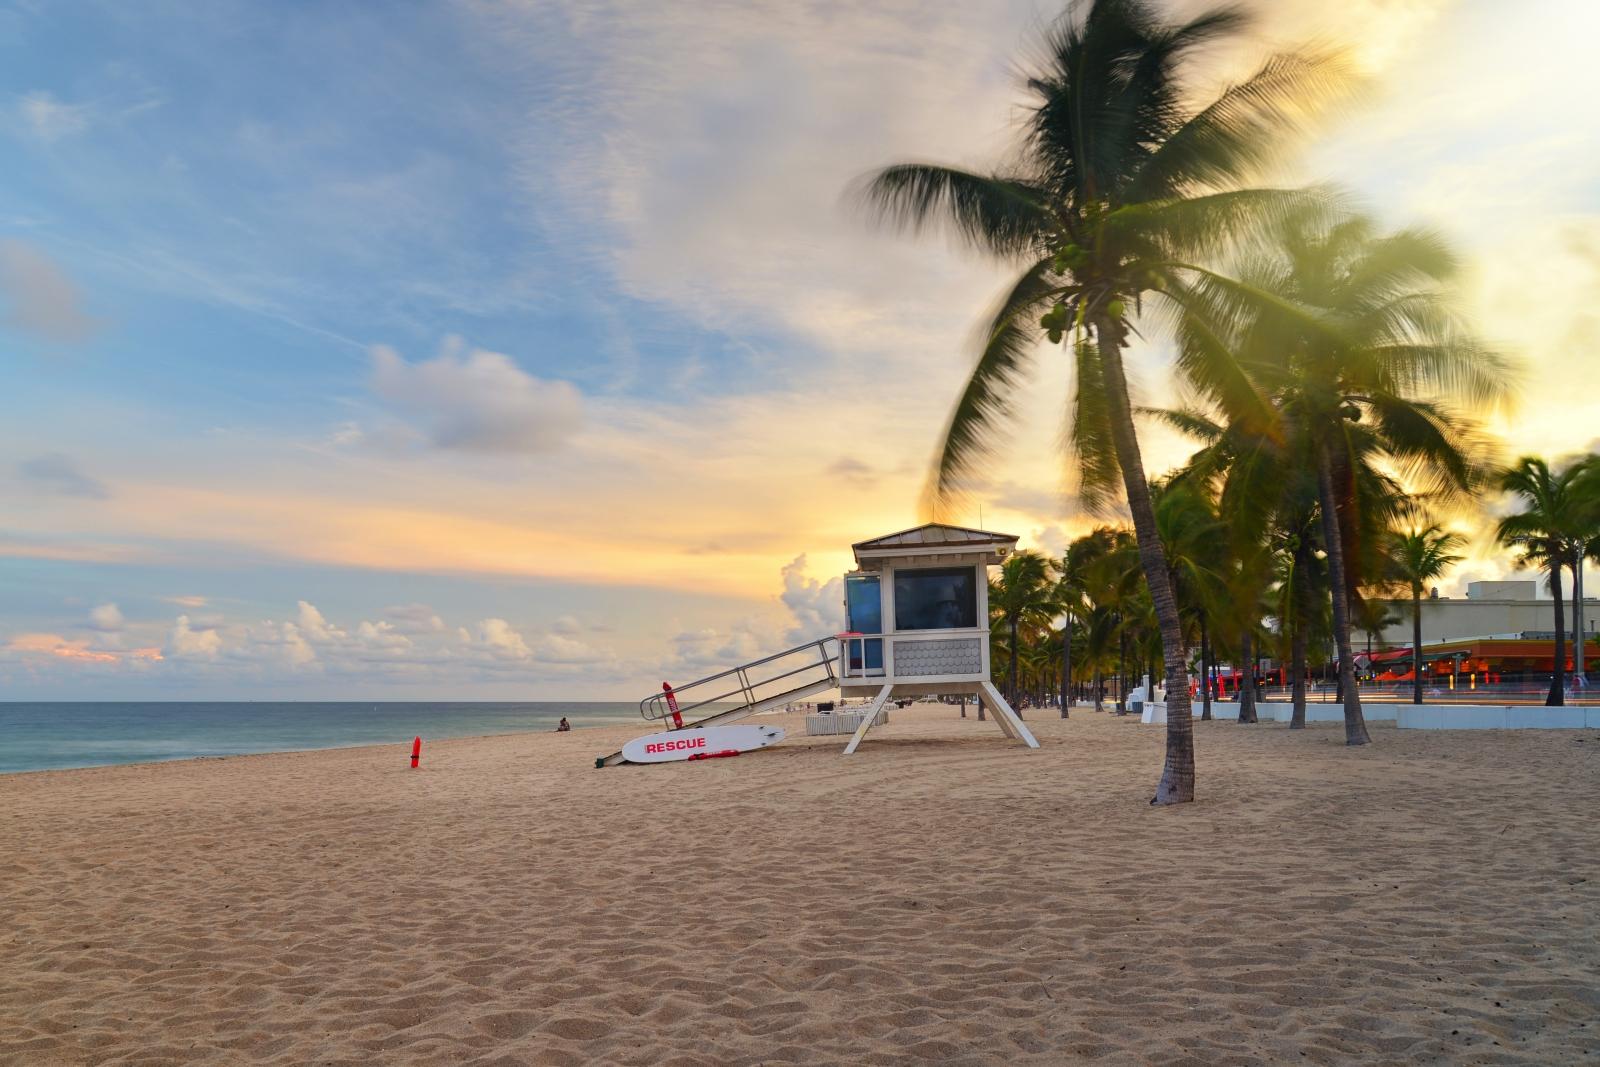 Las Olas Beach Fort Lauderdale Fl